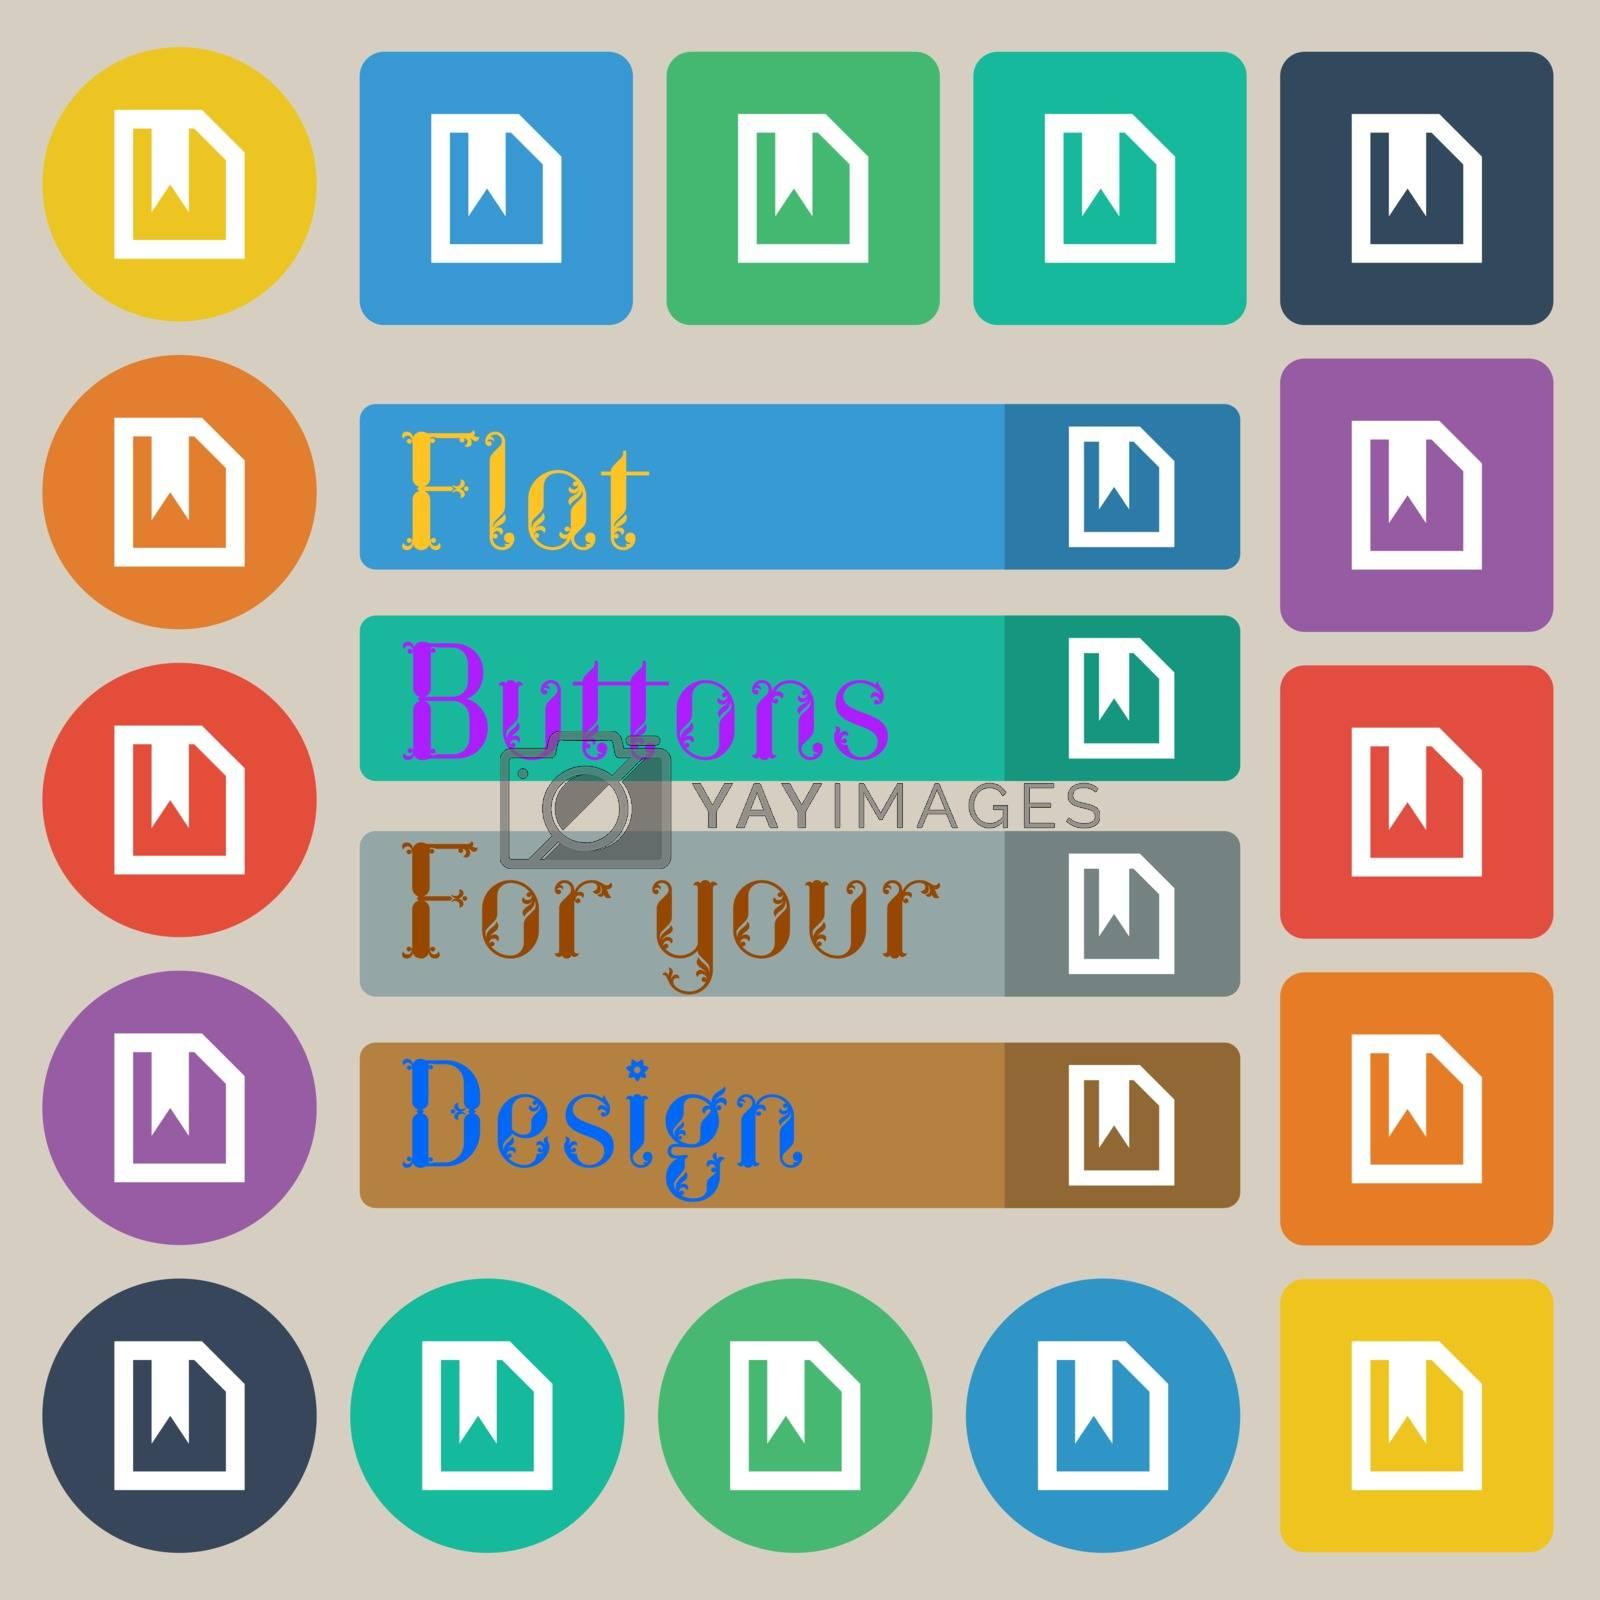 Royalty free image of bookmark  by serhii_lohvyniuk